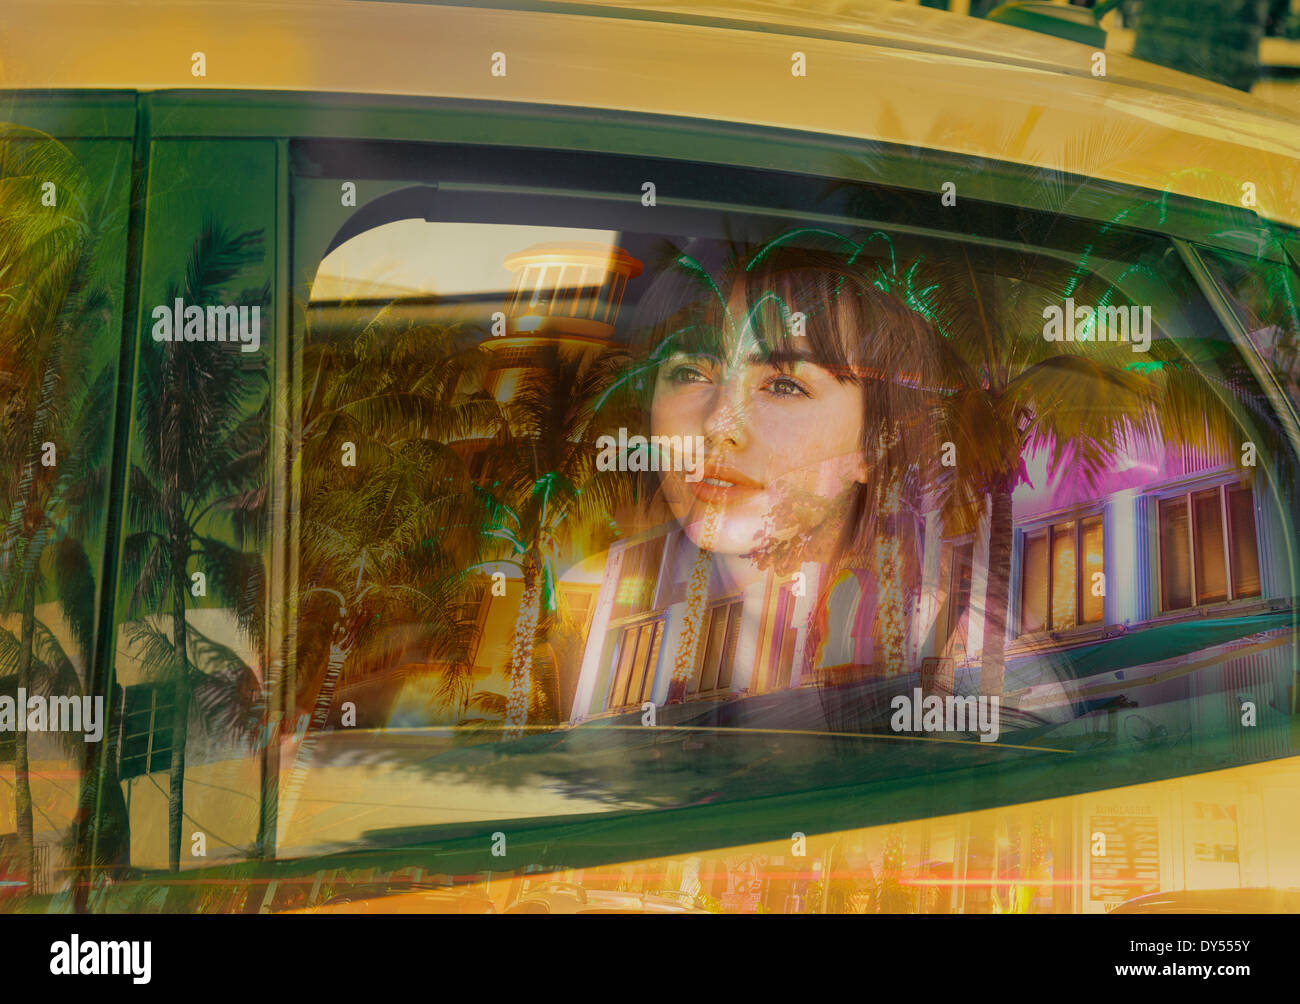 Junge Frau hinter dem taxi Stockbild